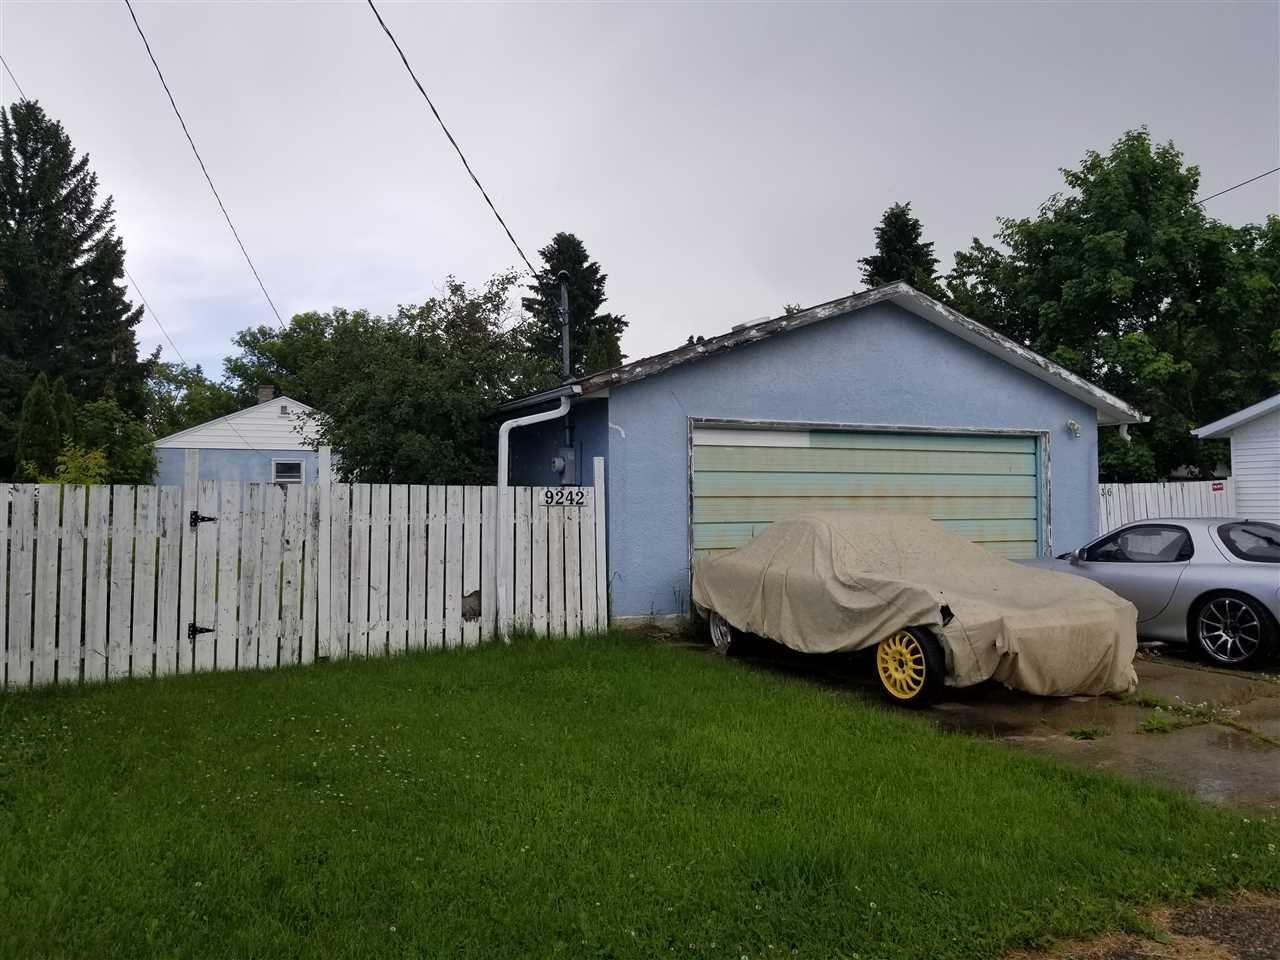 Photo 2: Photos: 9242 152 Street in Edmonton: Zone 22 House for sale : MLS®# E4158939